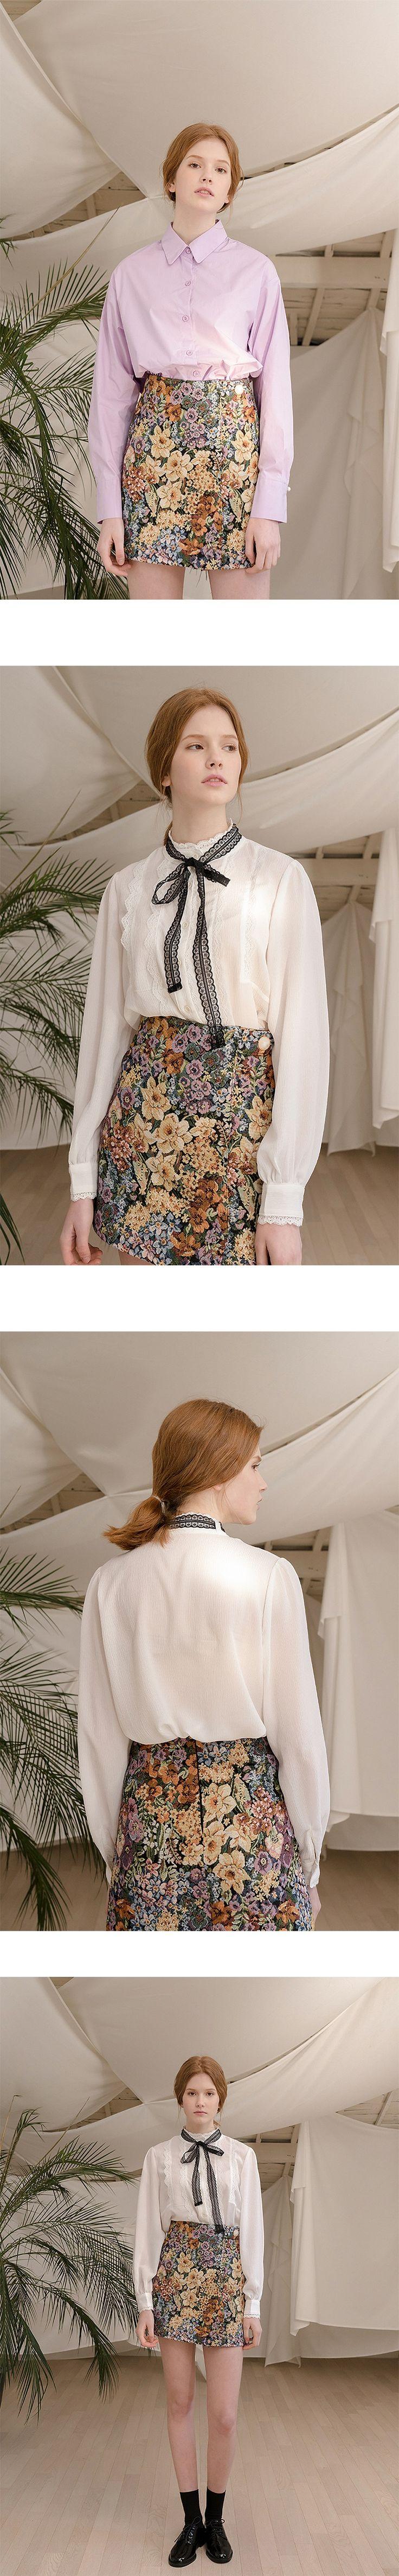 MONTS Monts600 Floral Jacquard Skirt